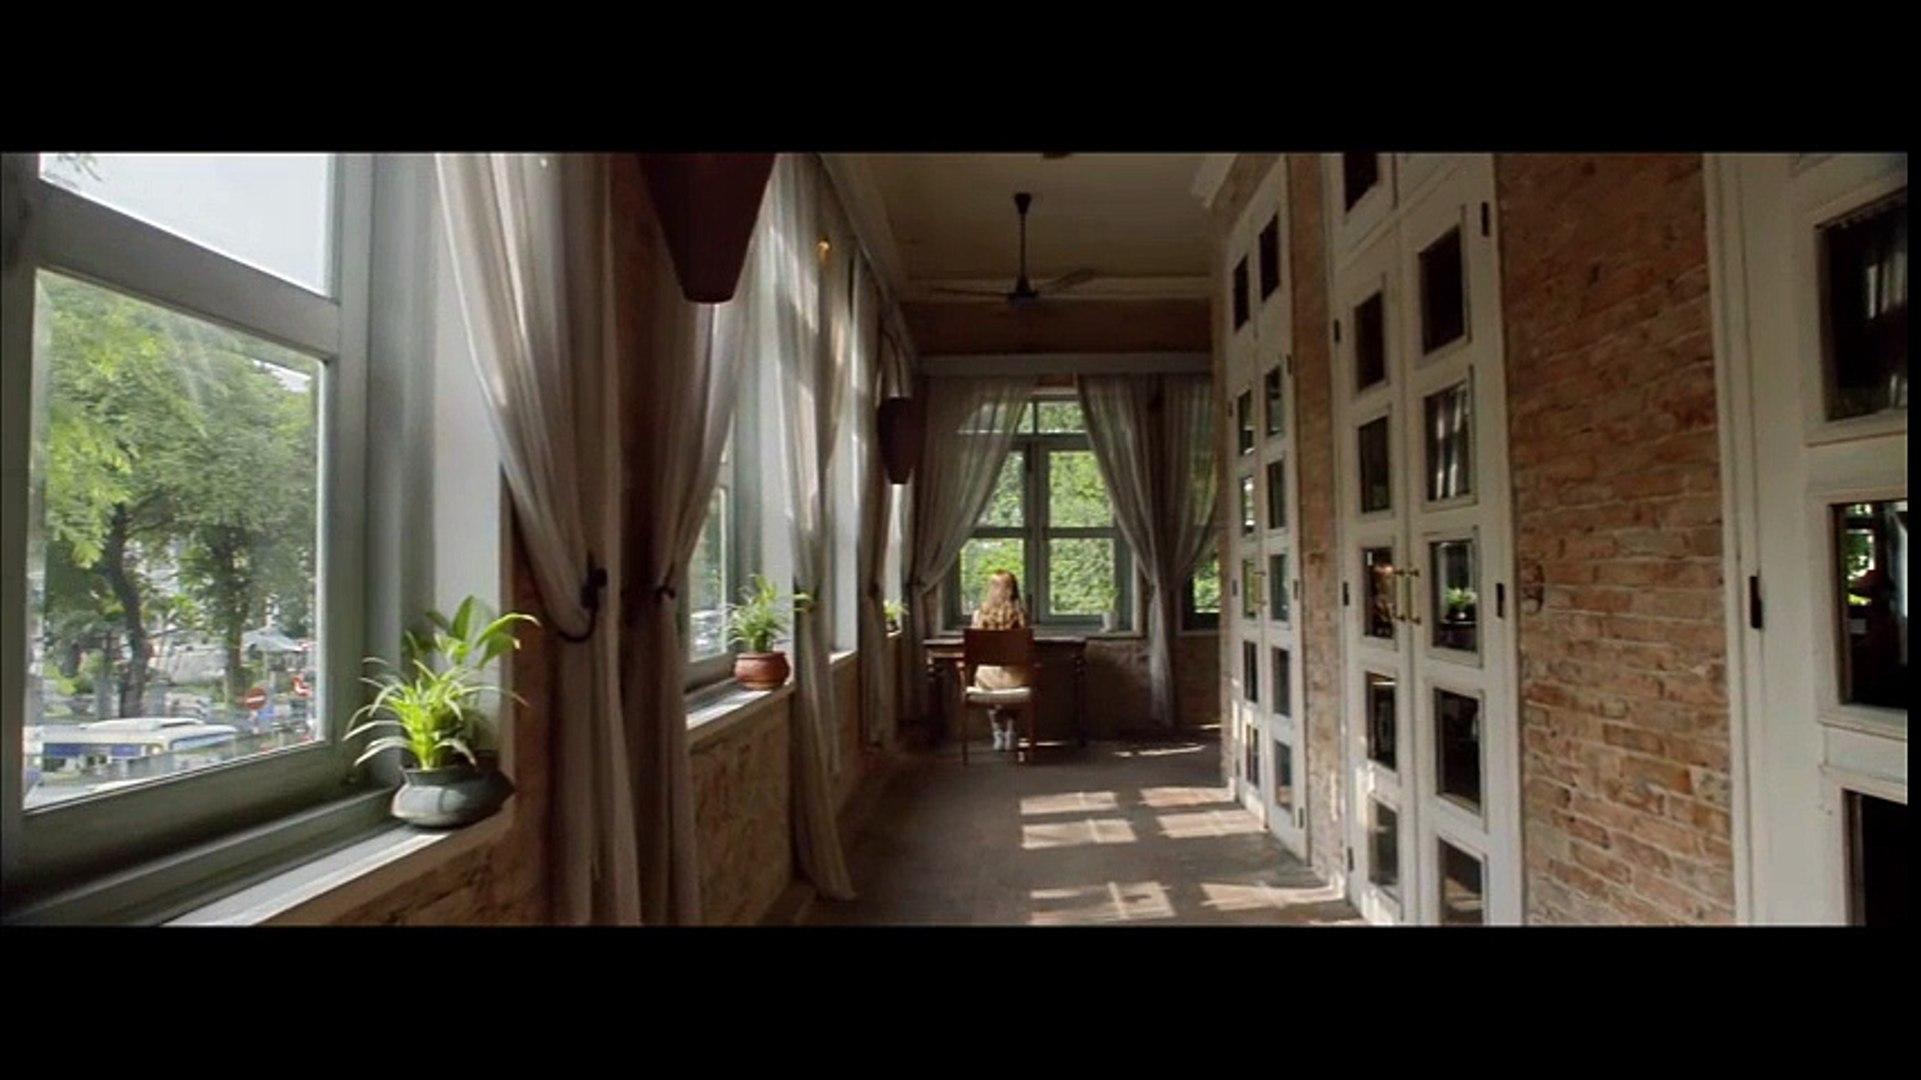 MV nhạc phim Yêu